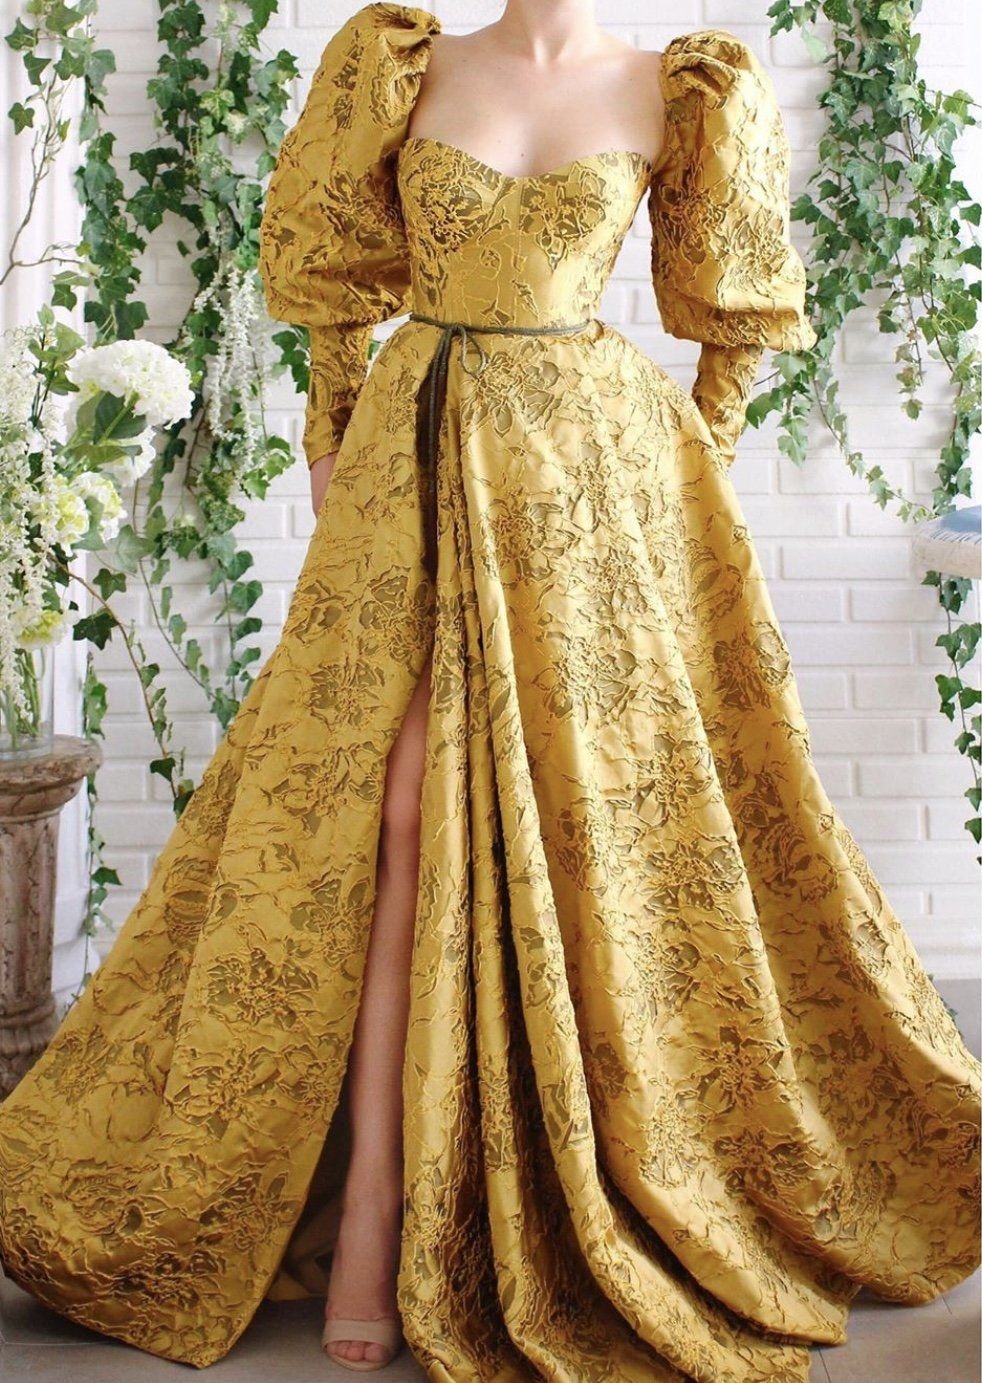 Serafina Puff Sleeve Gown Elegant Dresses For Women Filipiniana Dress Dresses [ 1383 x 982 Pixel ]